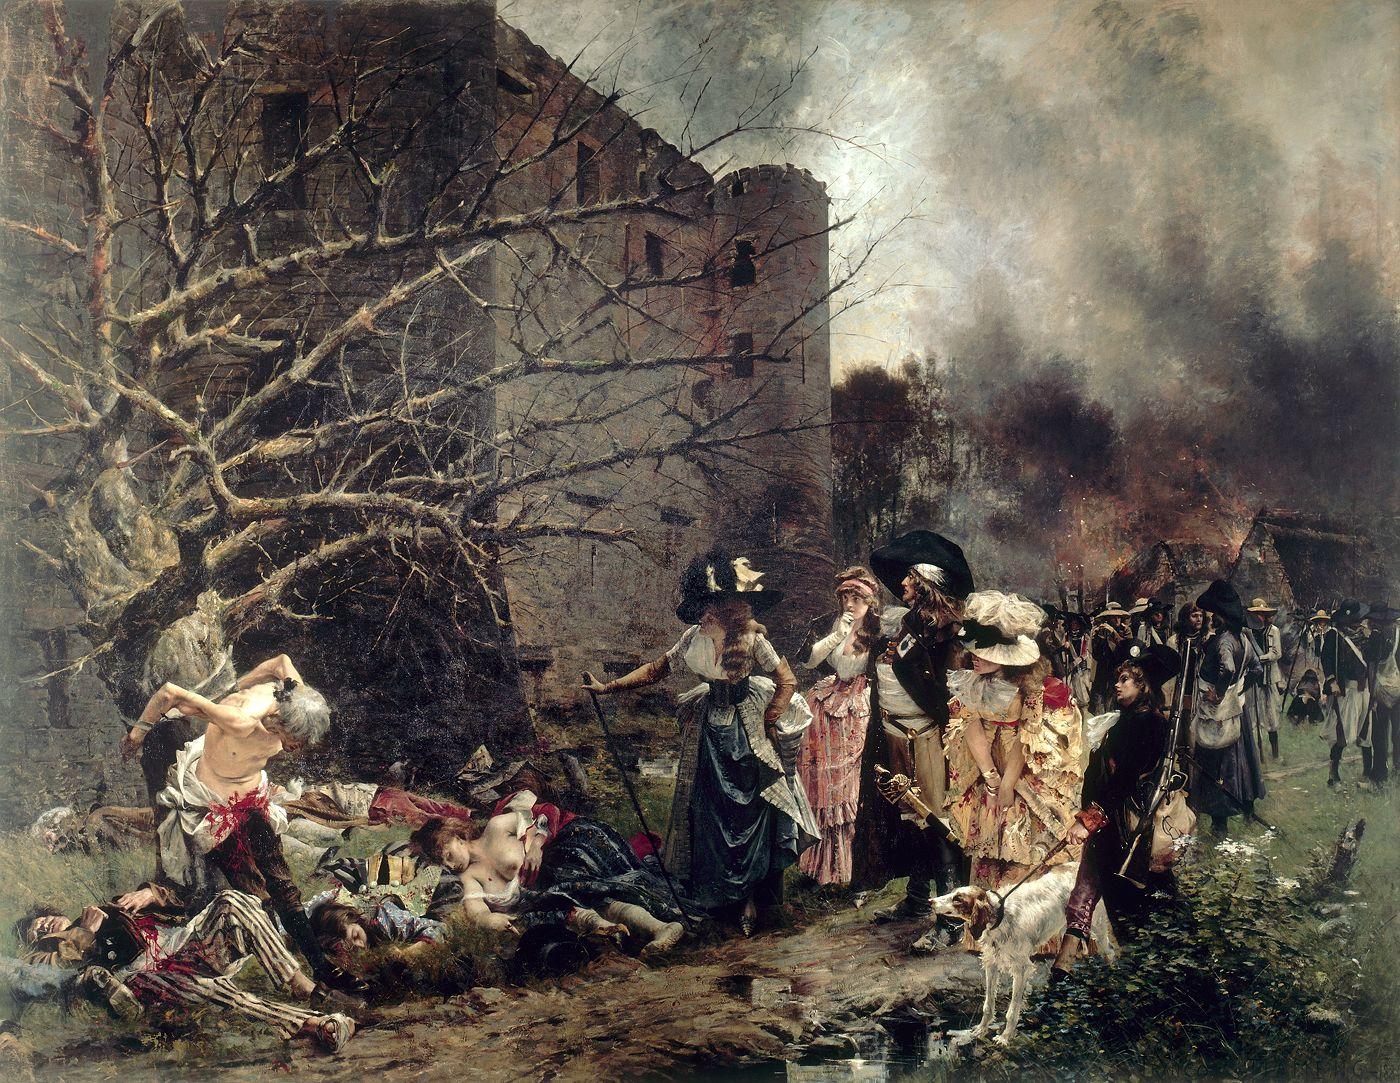 https://upload.wikimedia.org/wikipedia/commons/0/0f/Massacre_de_Machecoul.jpg